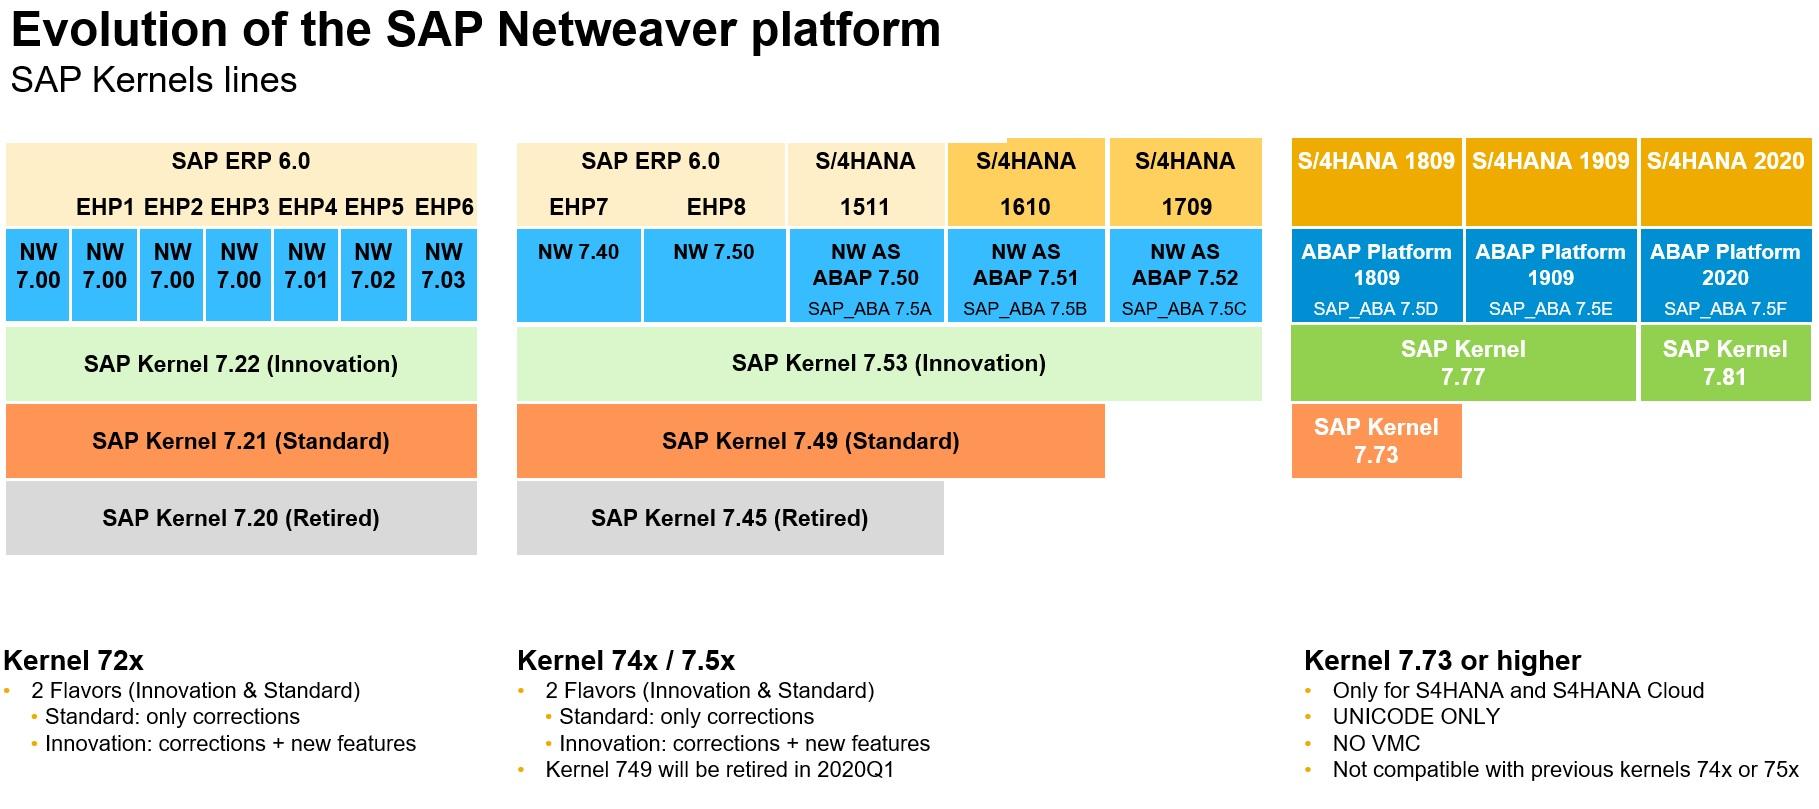 SAP%20Netweaver%20and%20ABAP%20Platform%20kernel%20versions